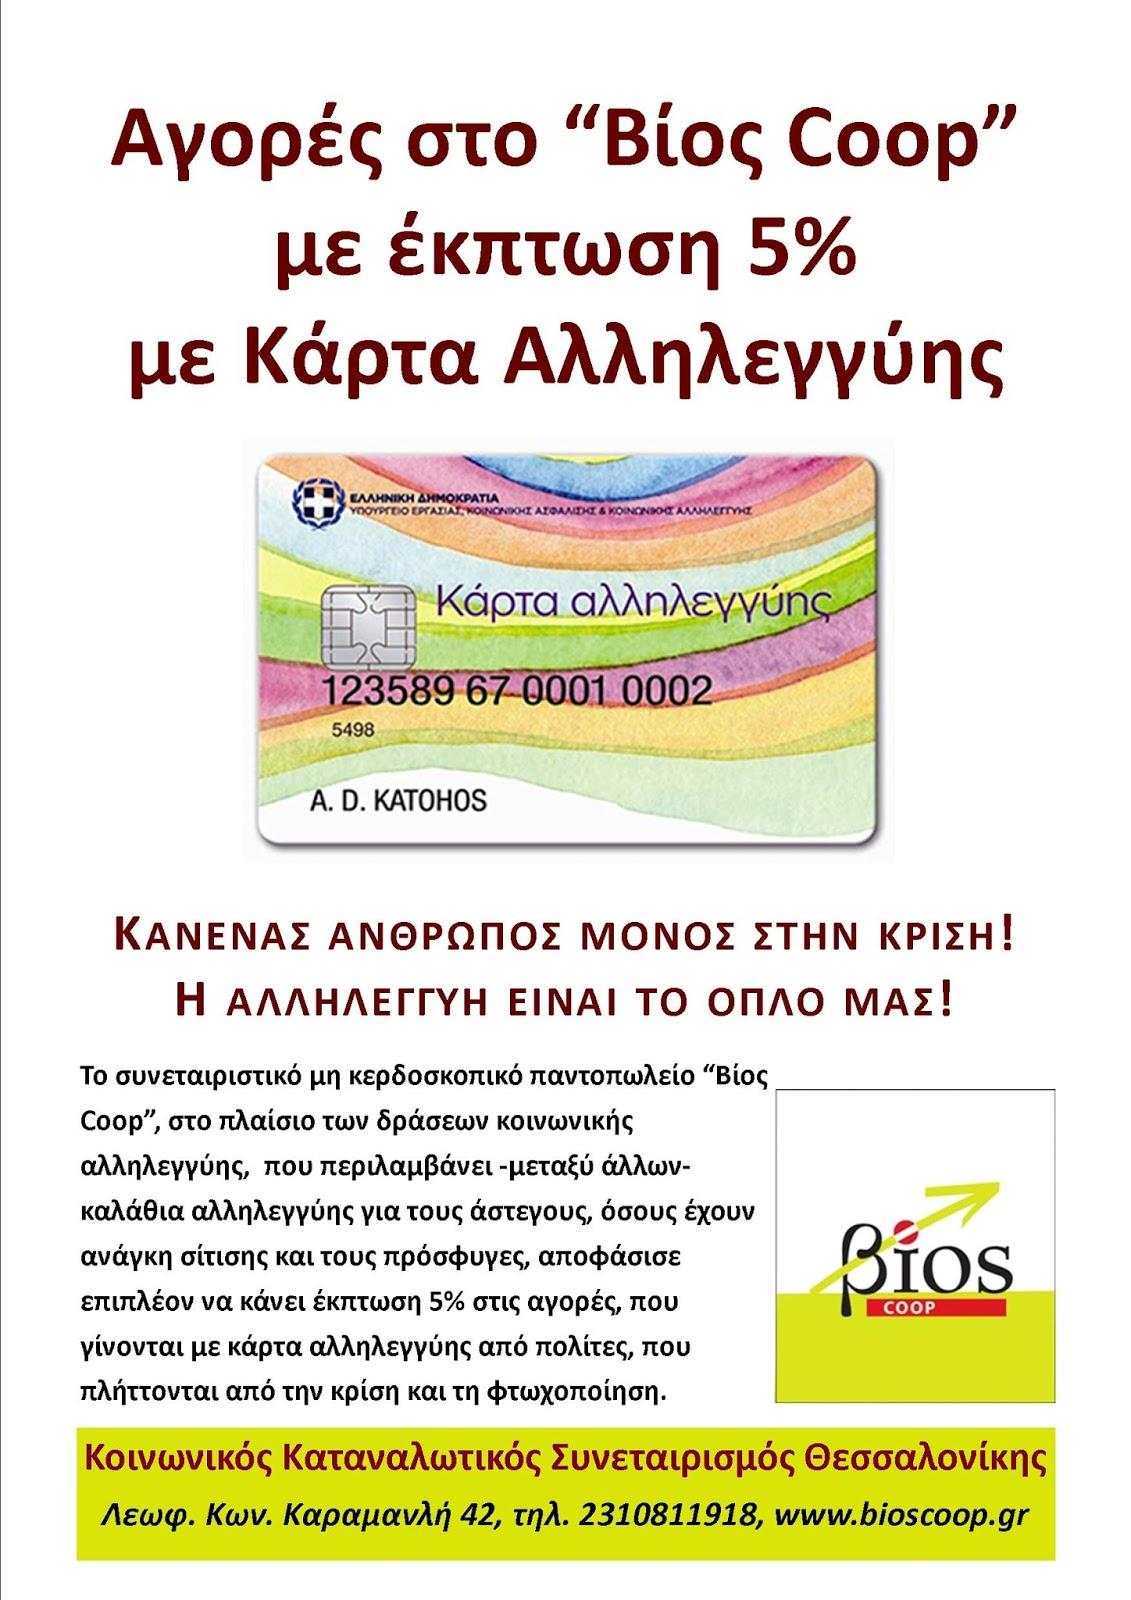 d480277100b Κοινωνικός Καταναλωτικός Συνεταιρισμός Θεσσαλονίκης